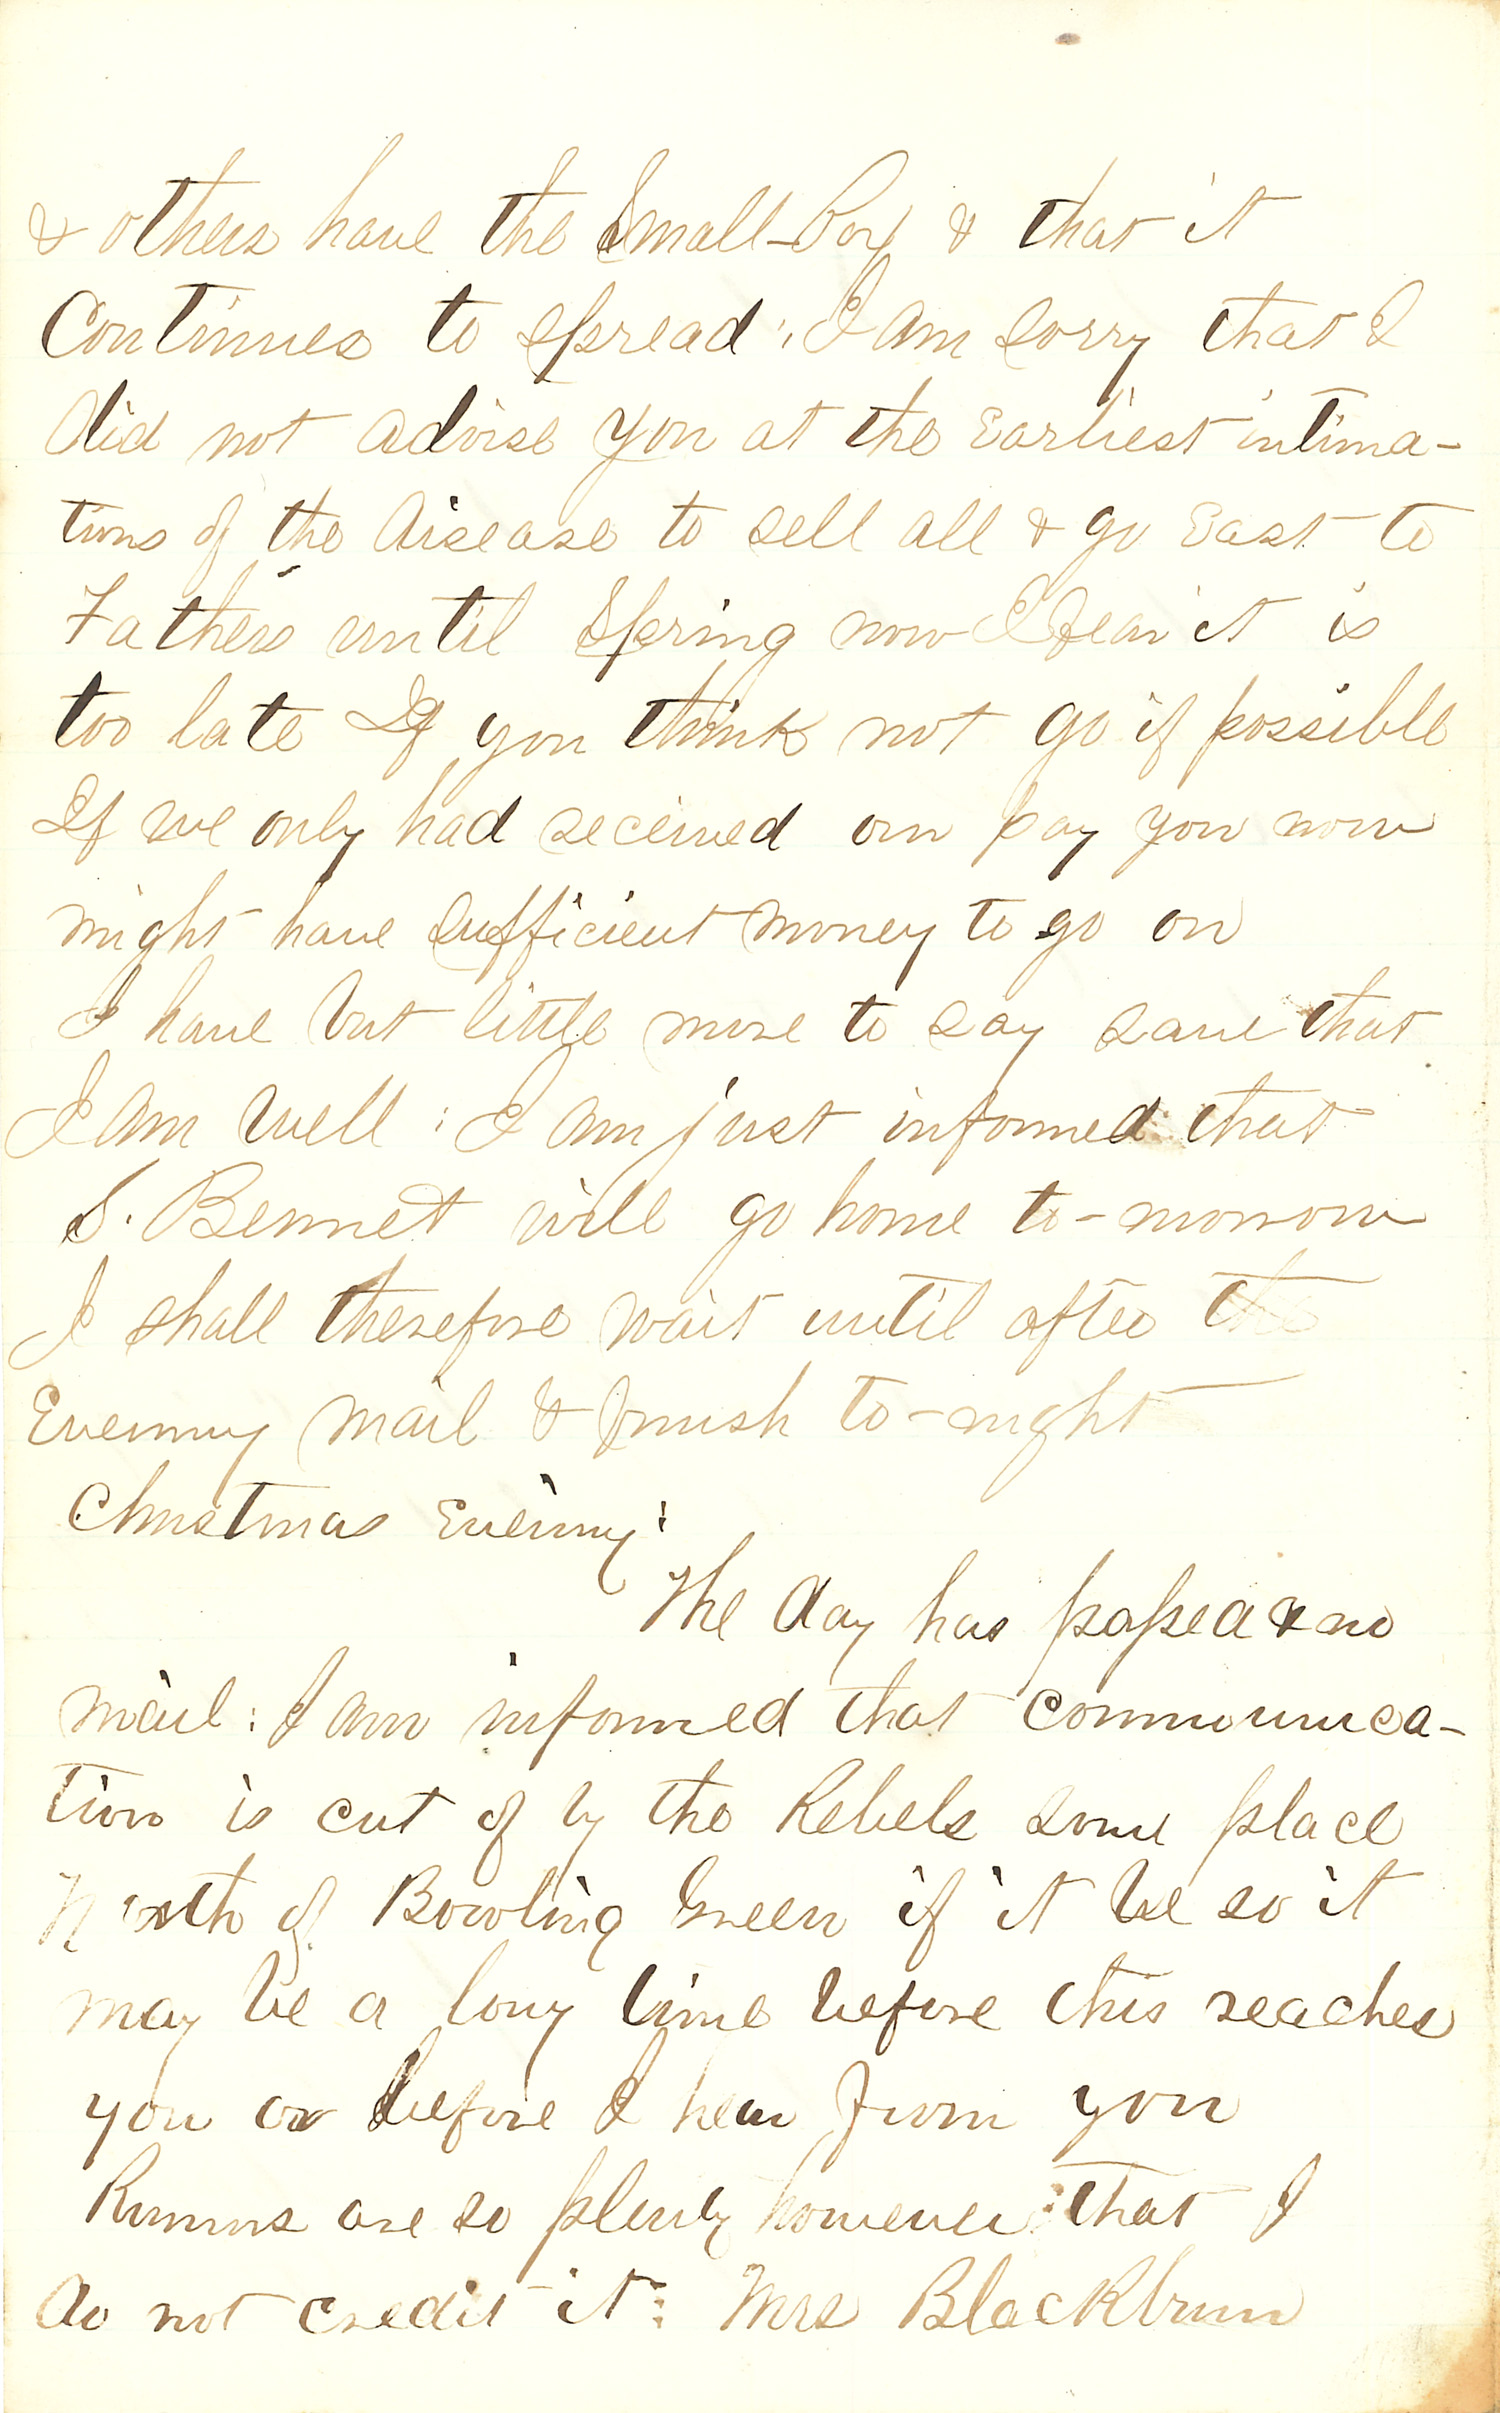 Joseph Culver Letter, December 25, 1862, Page 2